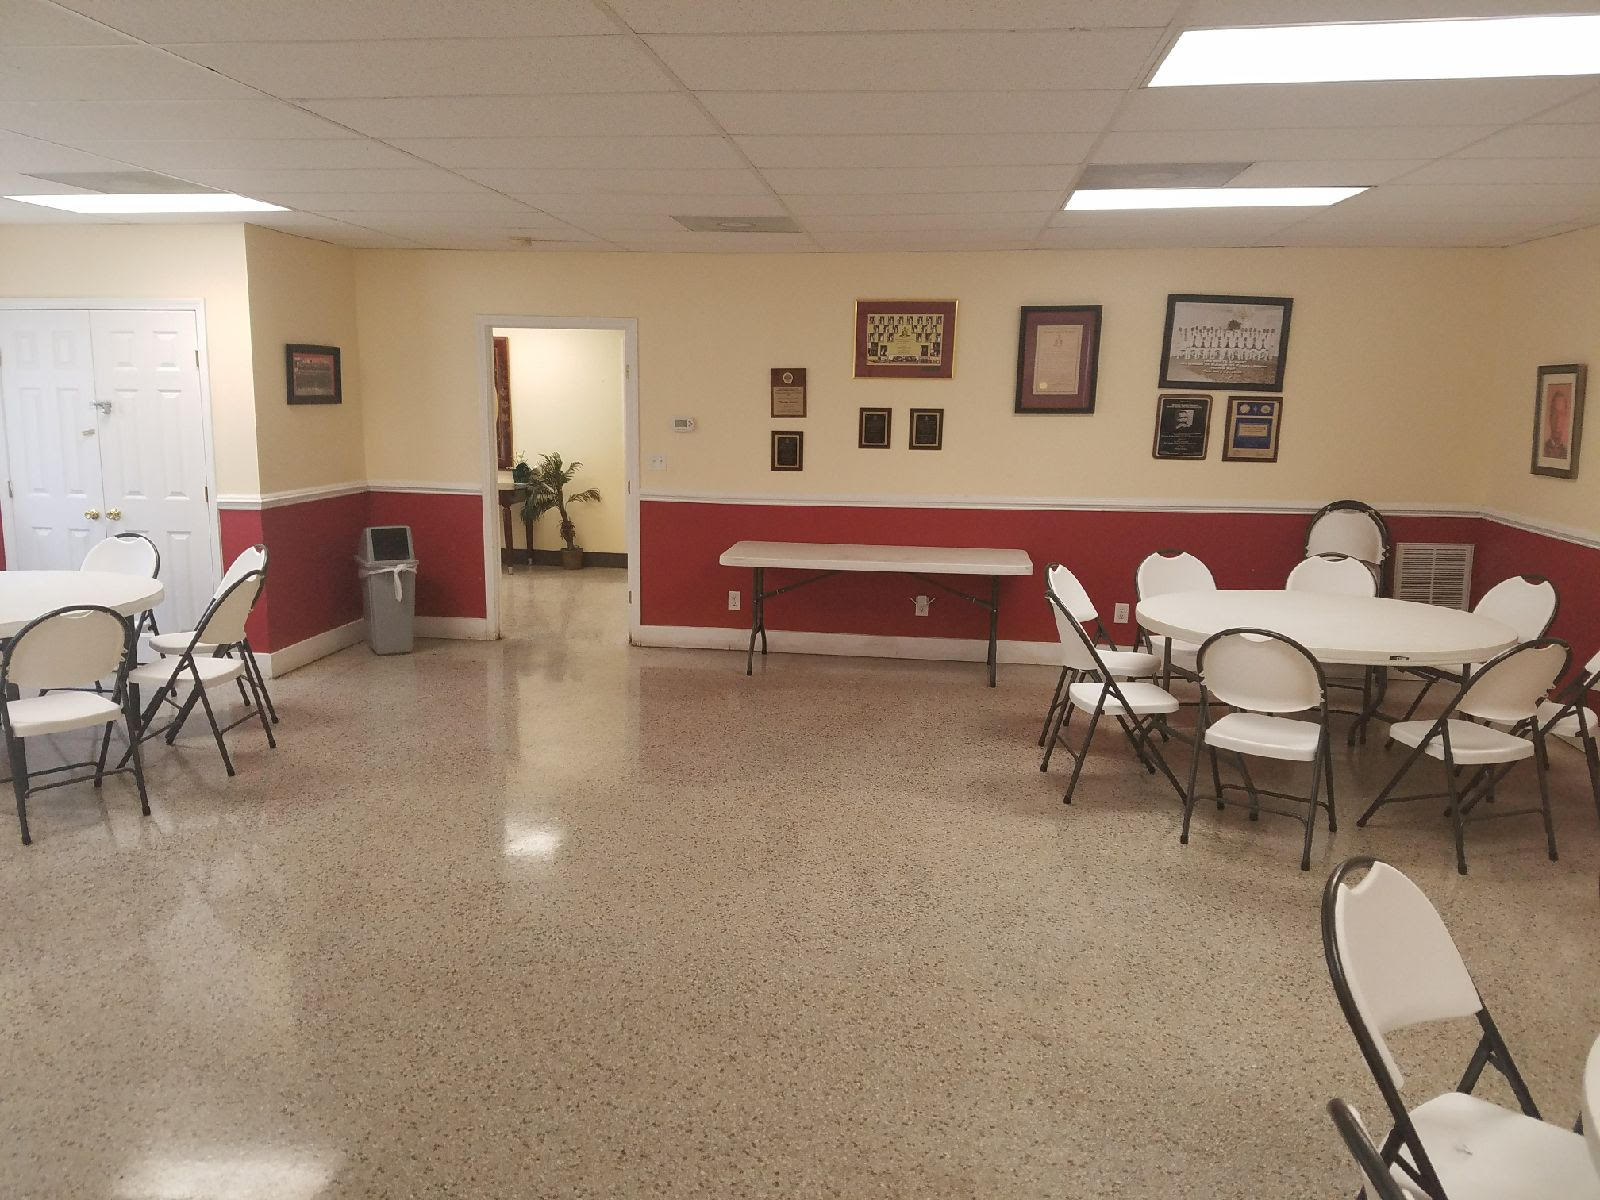 Kappa Center - Founder's Room3